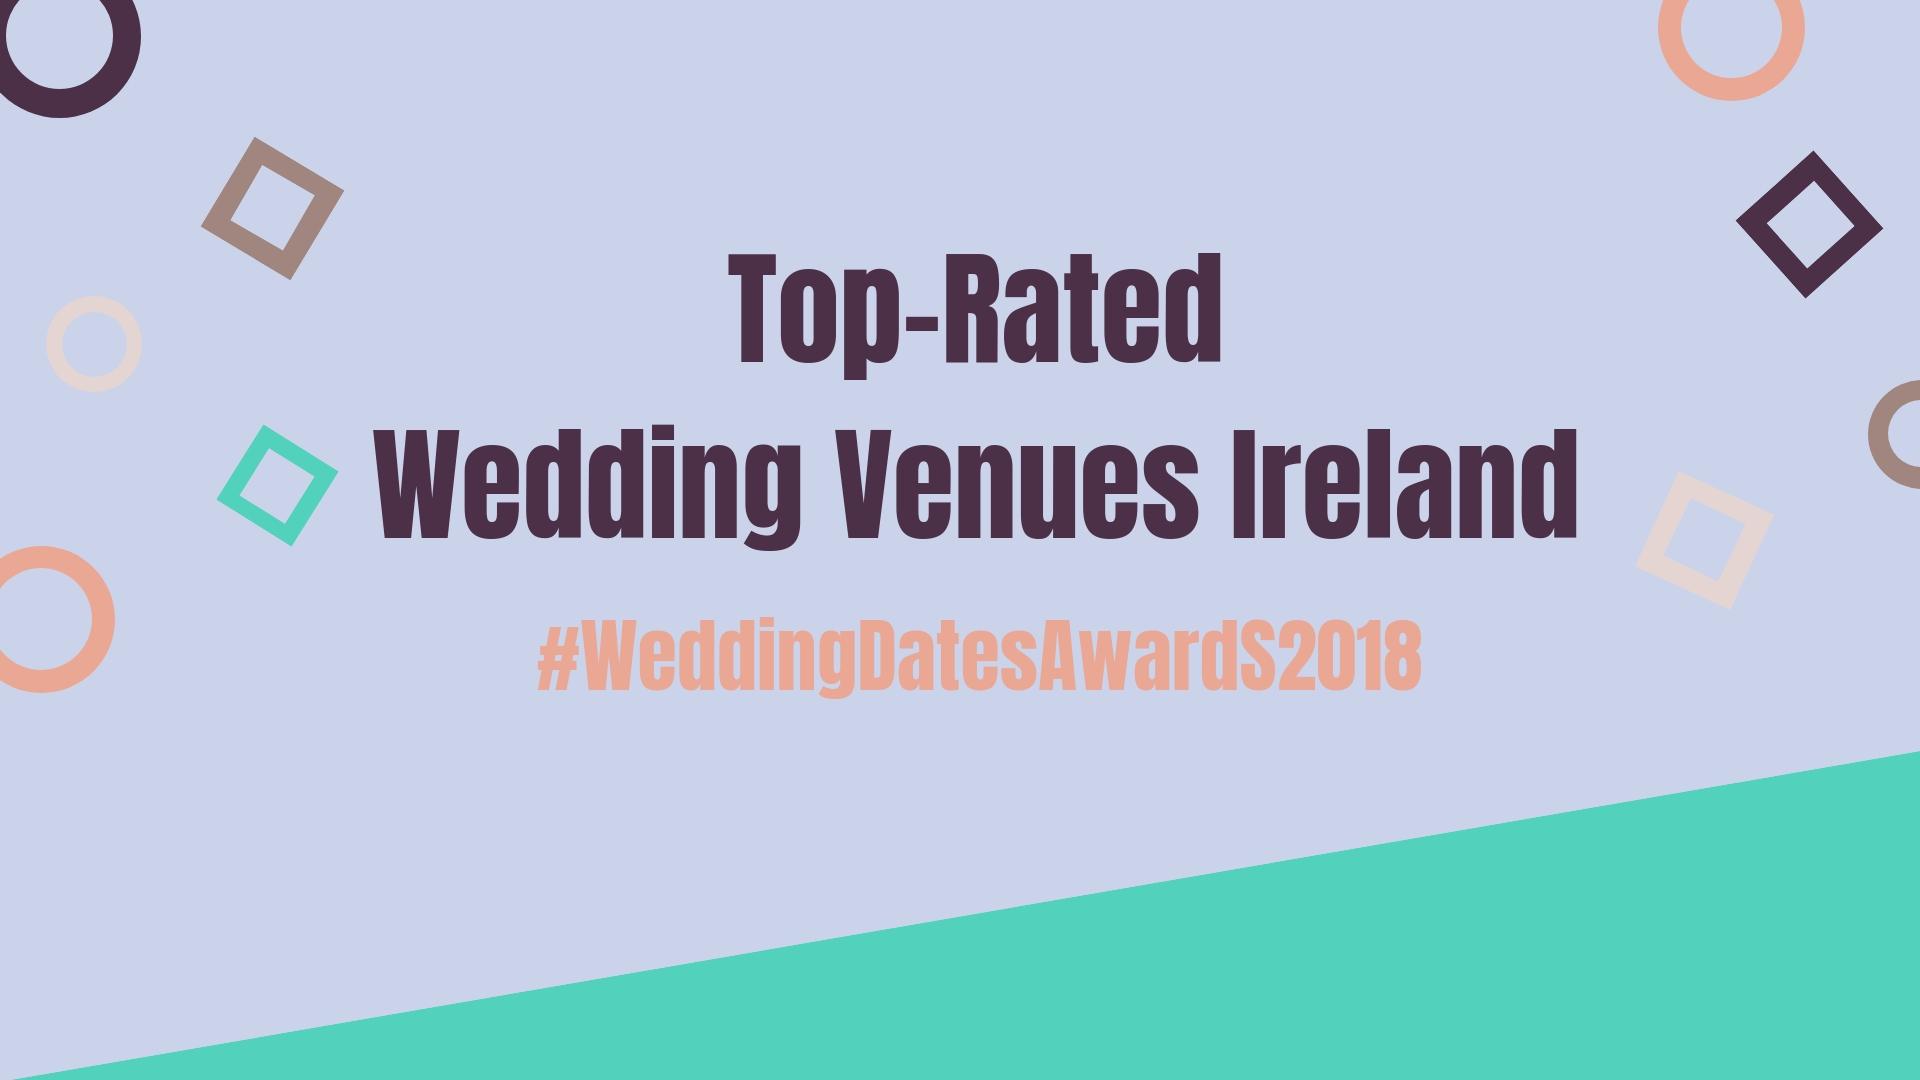 WEDDINGDATES AWARDS 2018: TOP RATED WEDDING VENUES ANNOUNCED